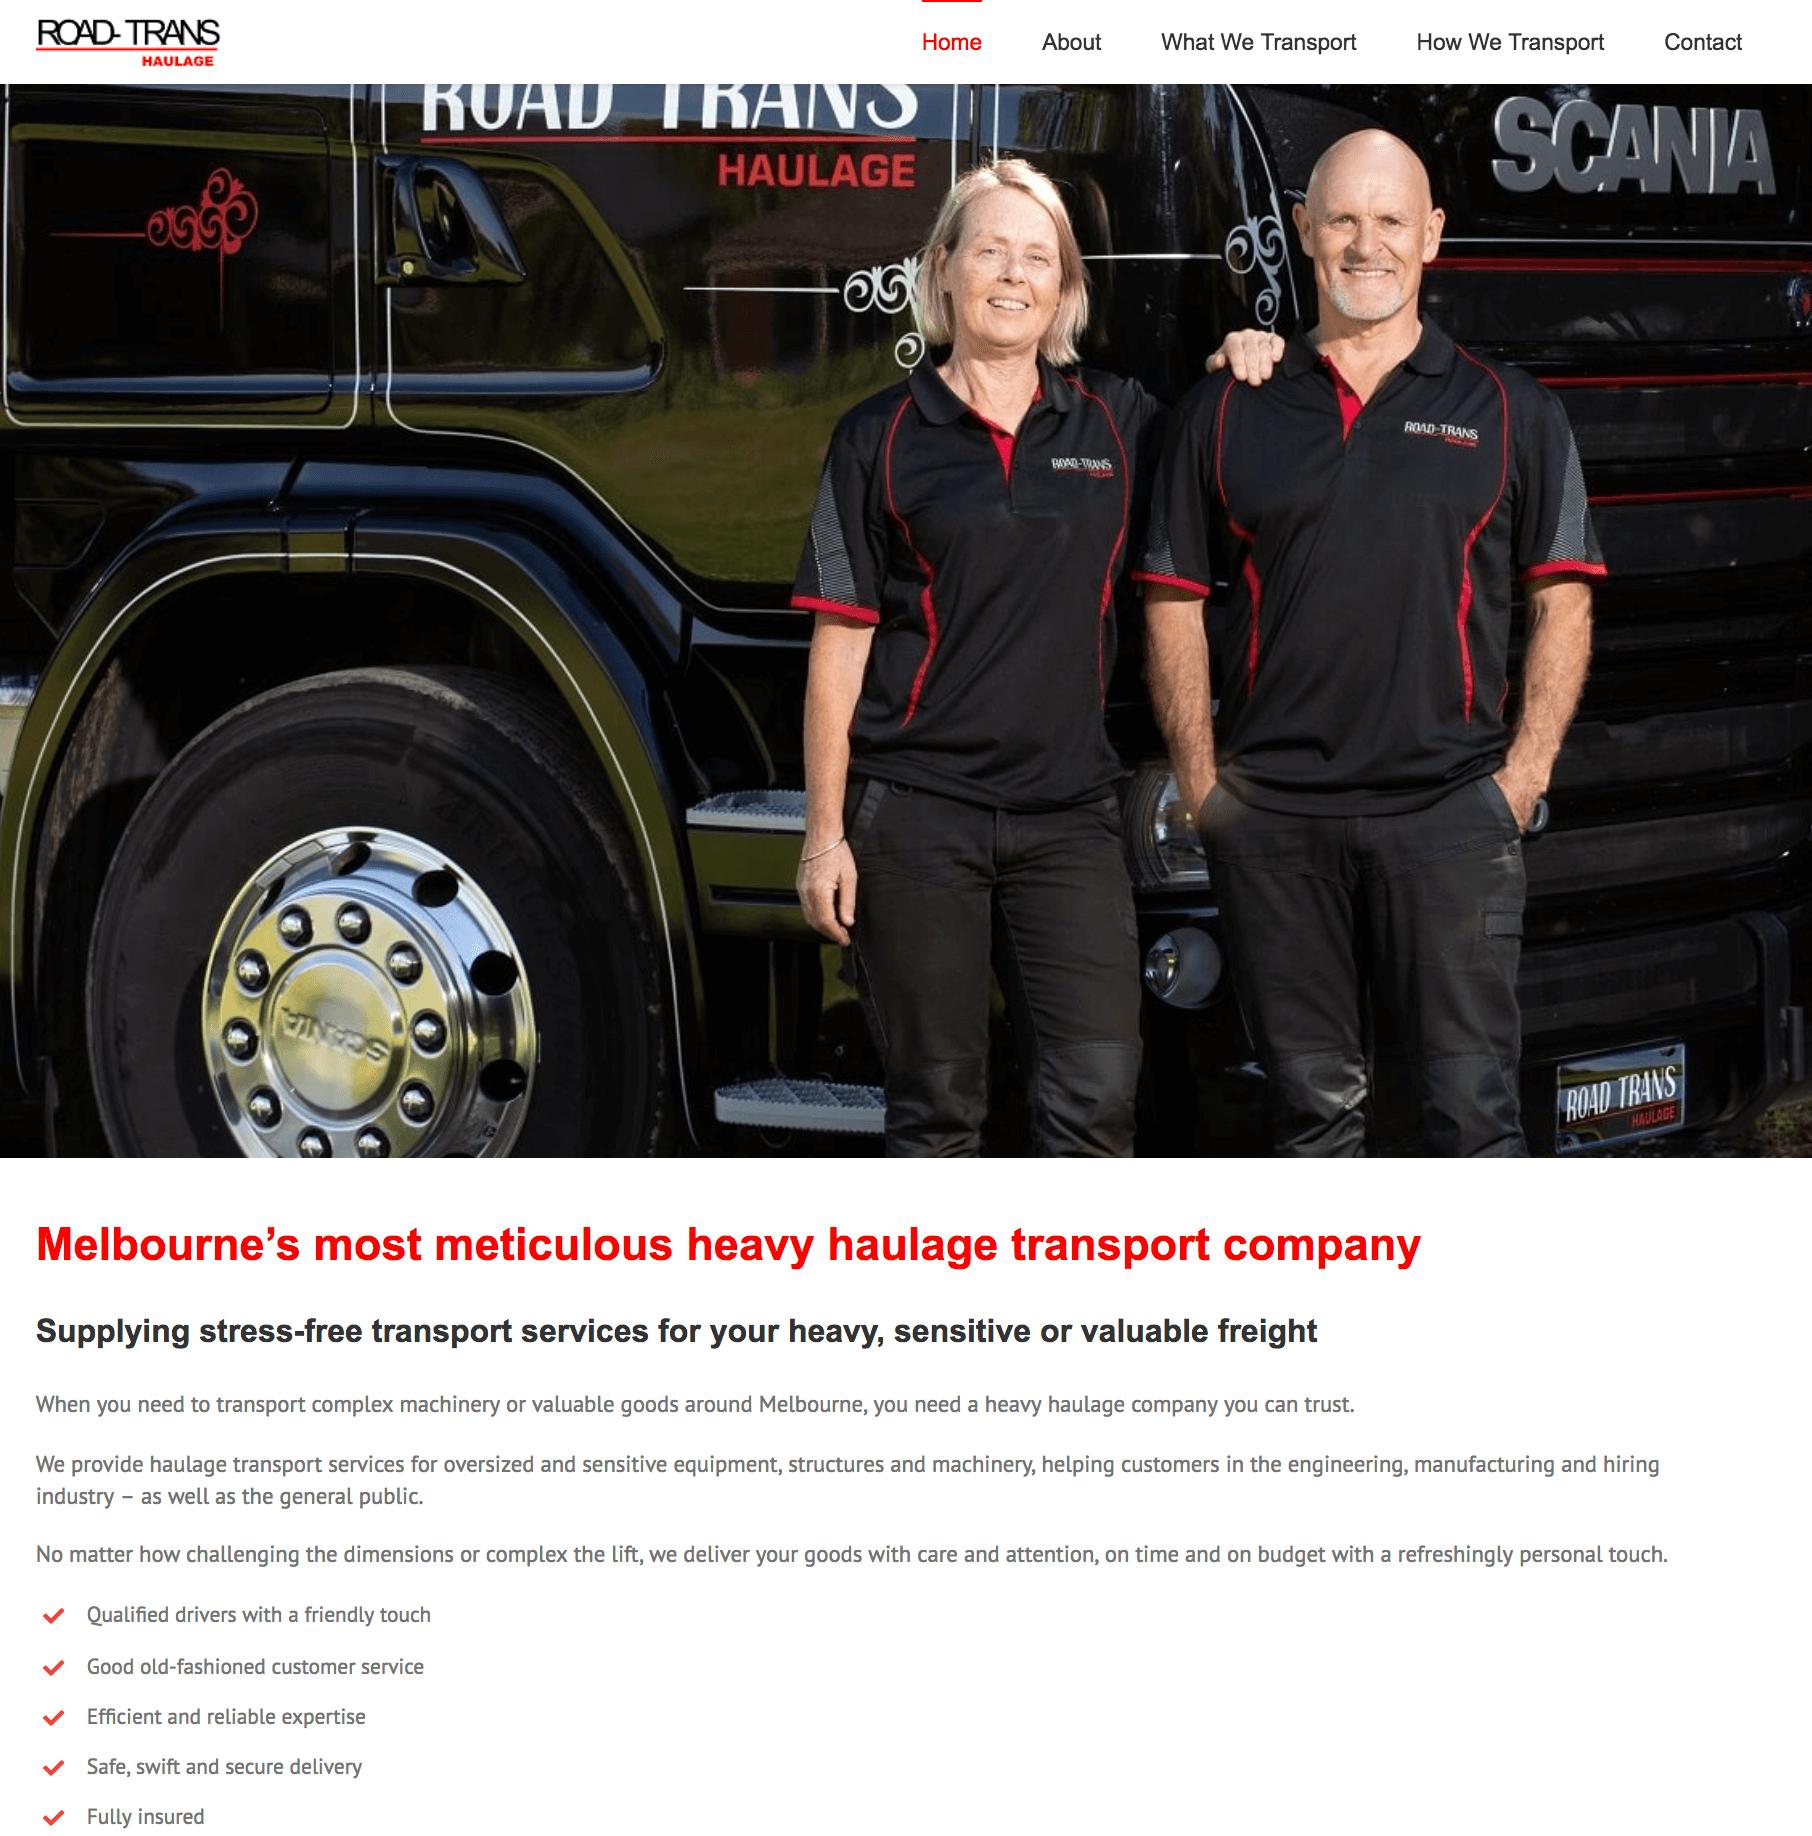 RoadTrans Haulage Home page copy